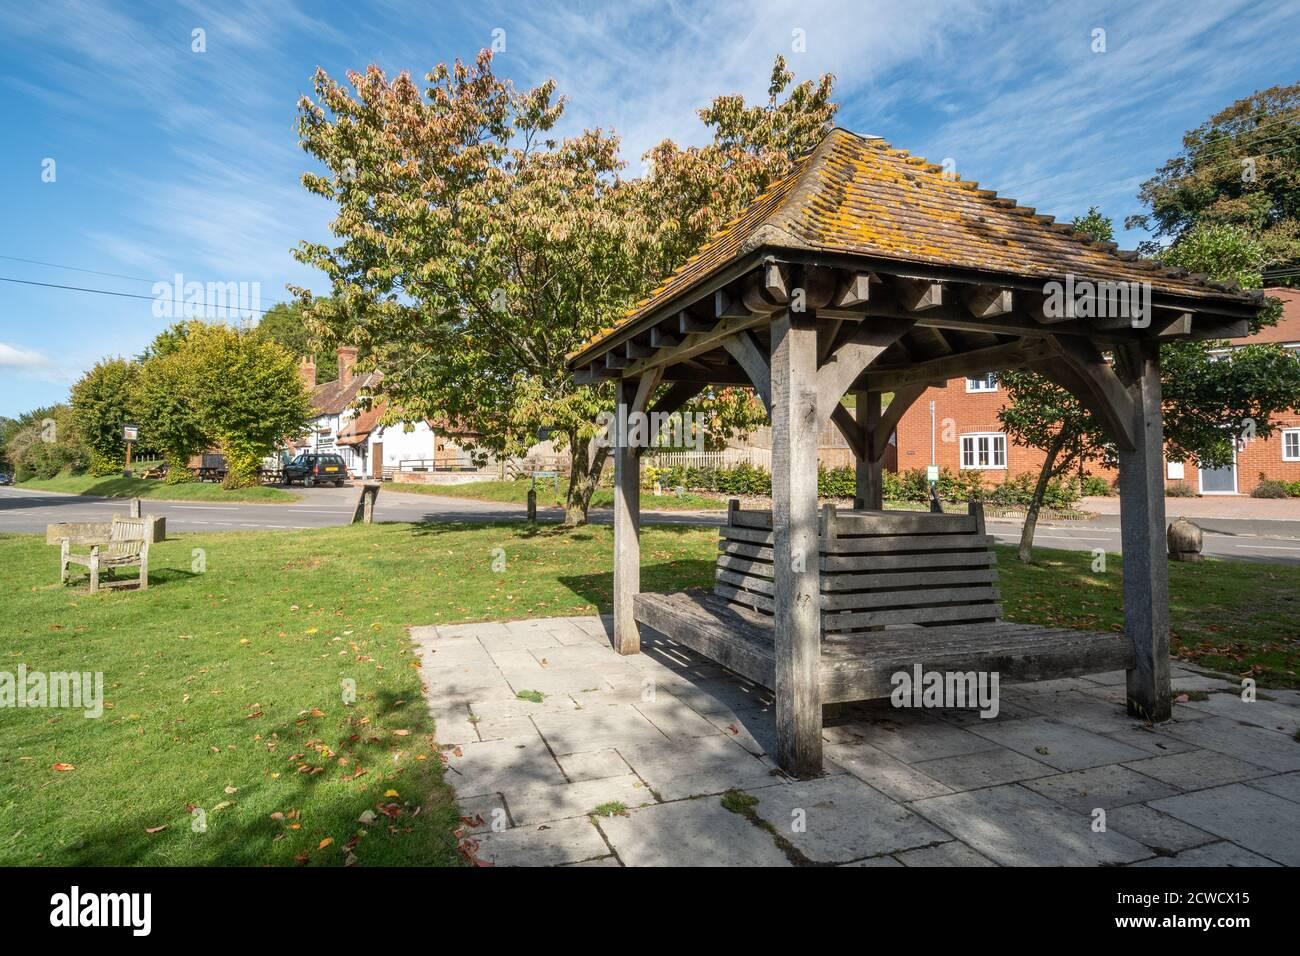 West Ilsley, Berkshire, UK - the gazebo built to mark the new millennium Stock Photo